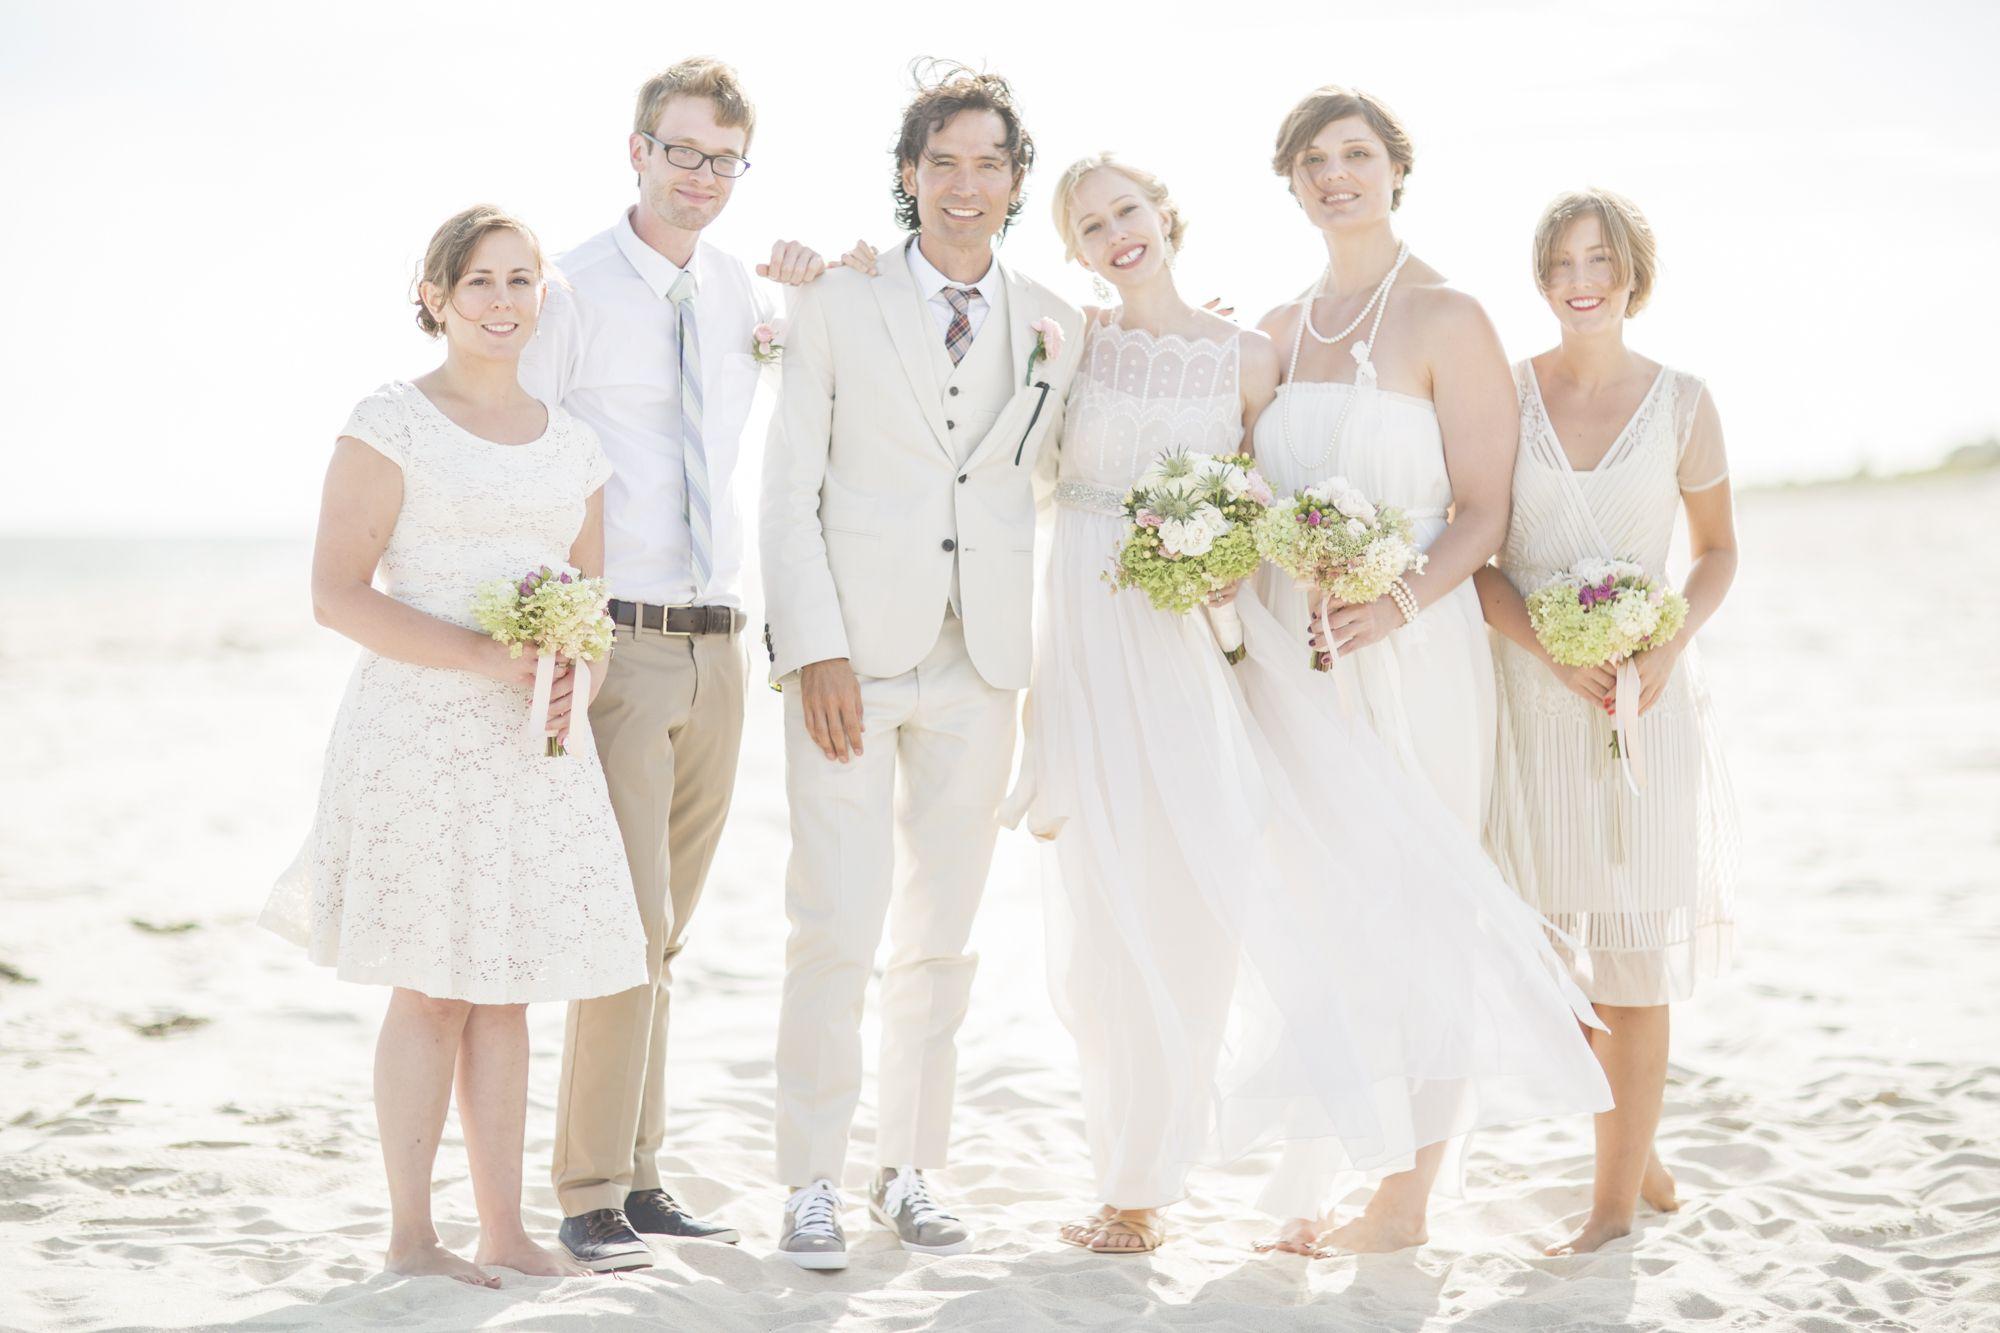 Nontraditional wedding attendants wedding ideas pinterest